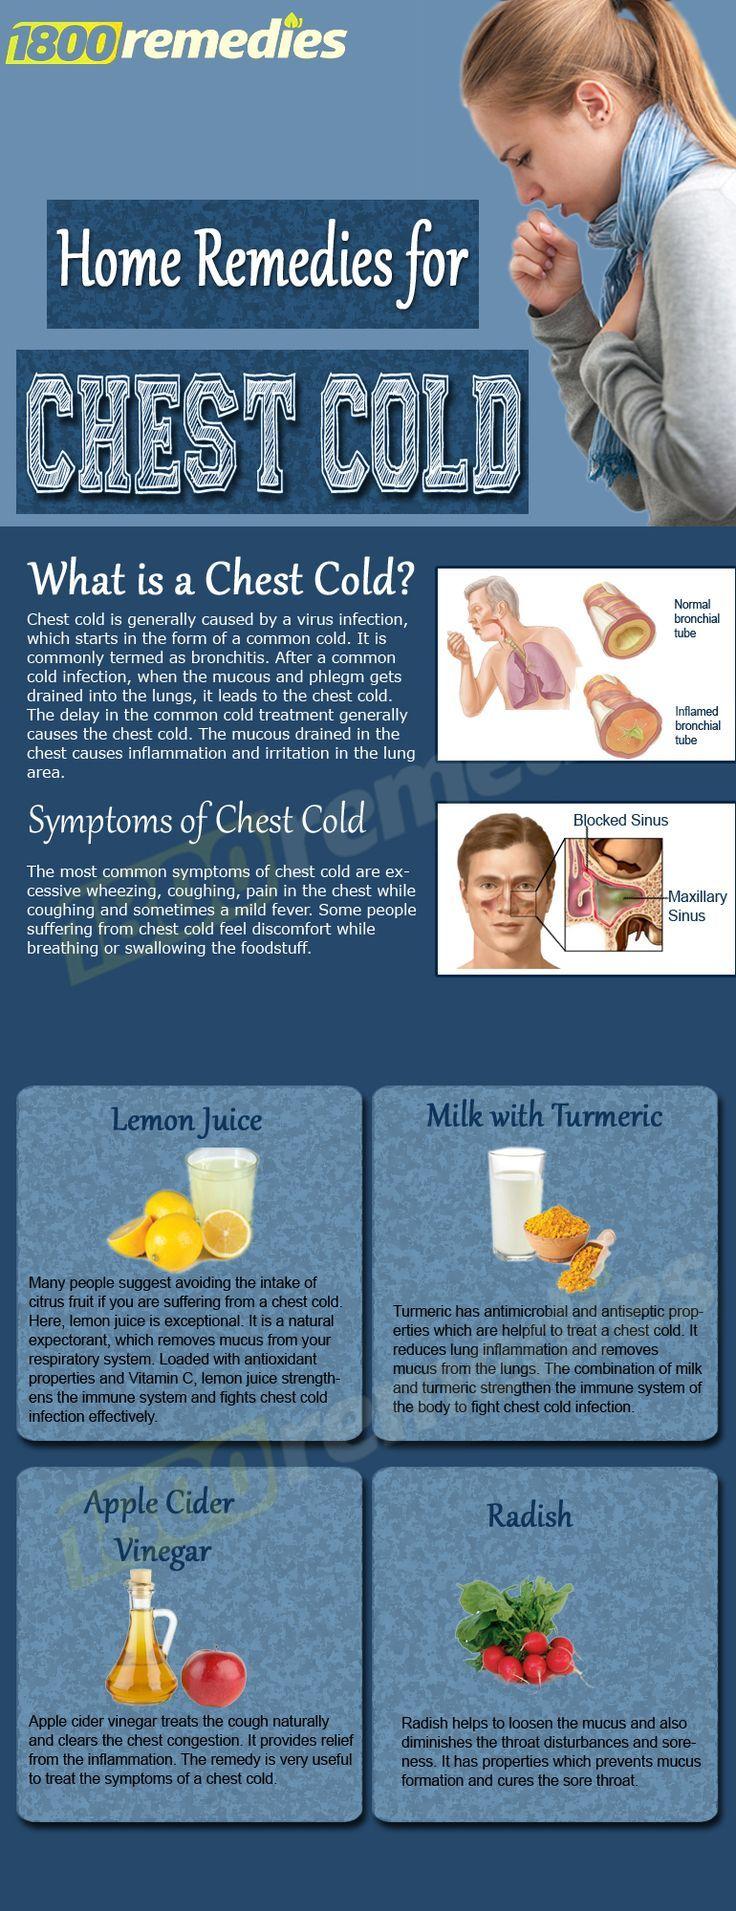 5bfab59d0e5cd1a79cfd856f23445726 - How To Get A Cold Out Of Your Chest